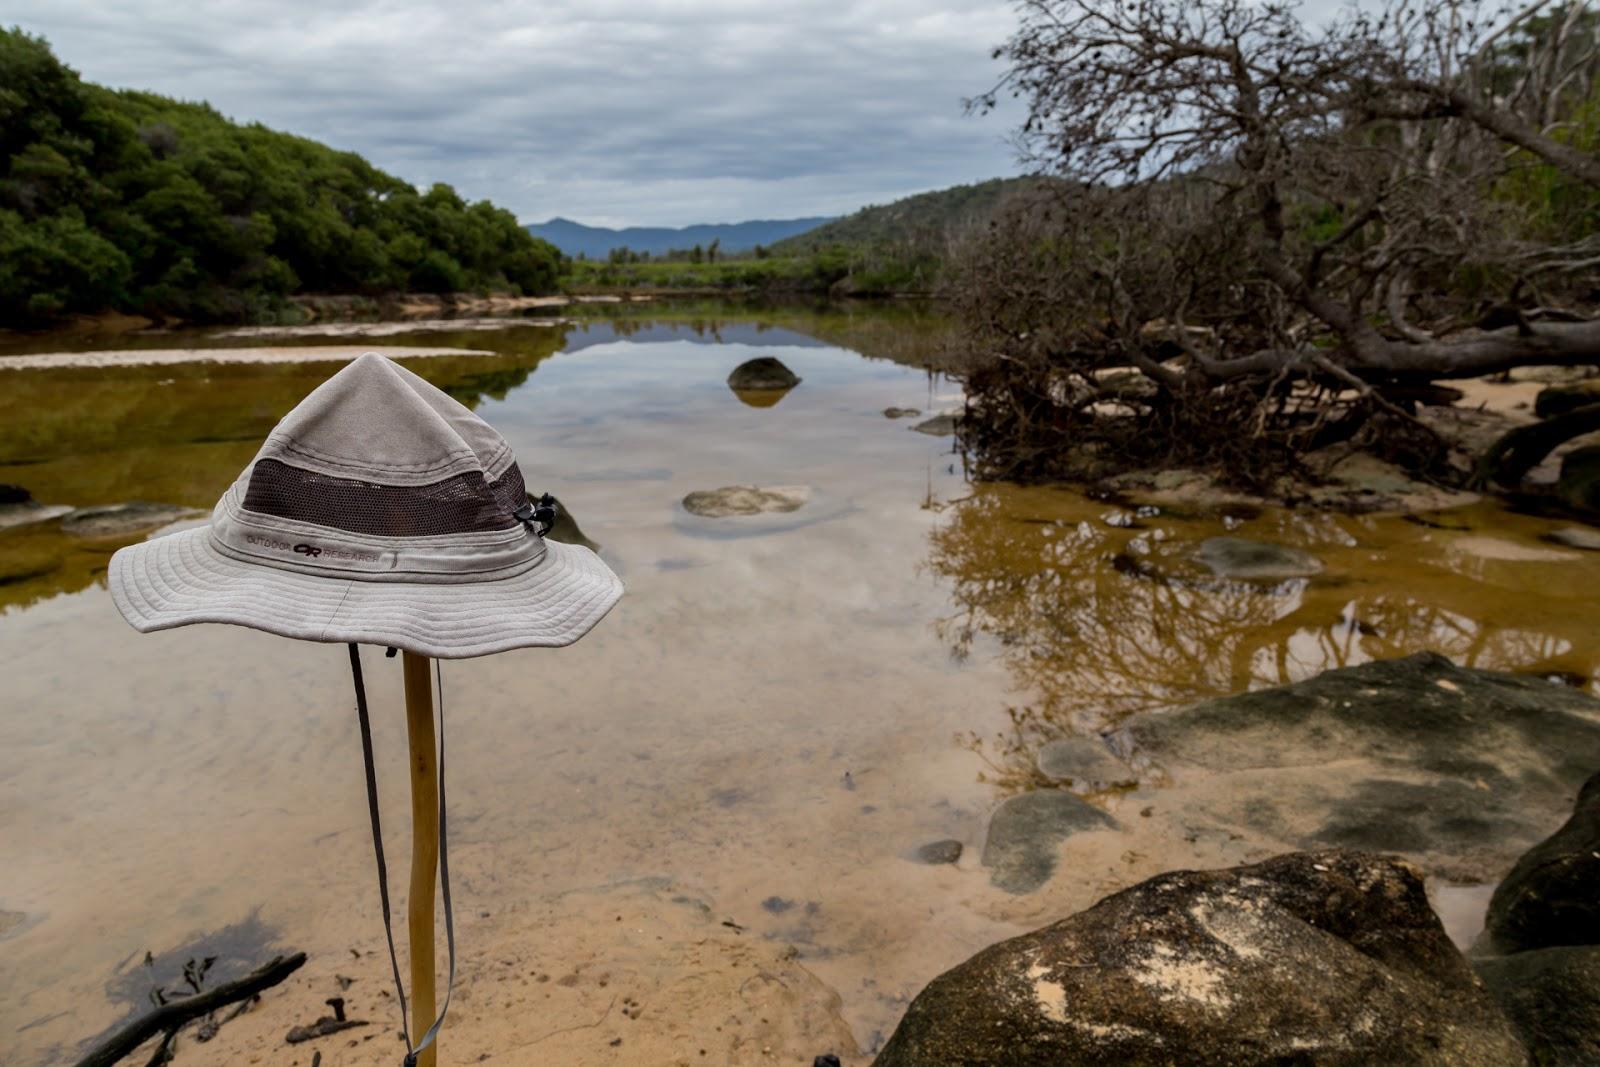 hat on stick miranda creek five mile beach wilsons promontory